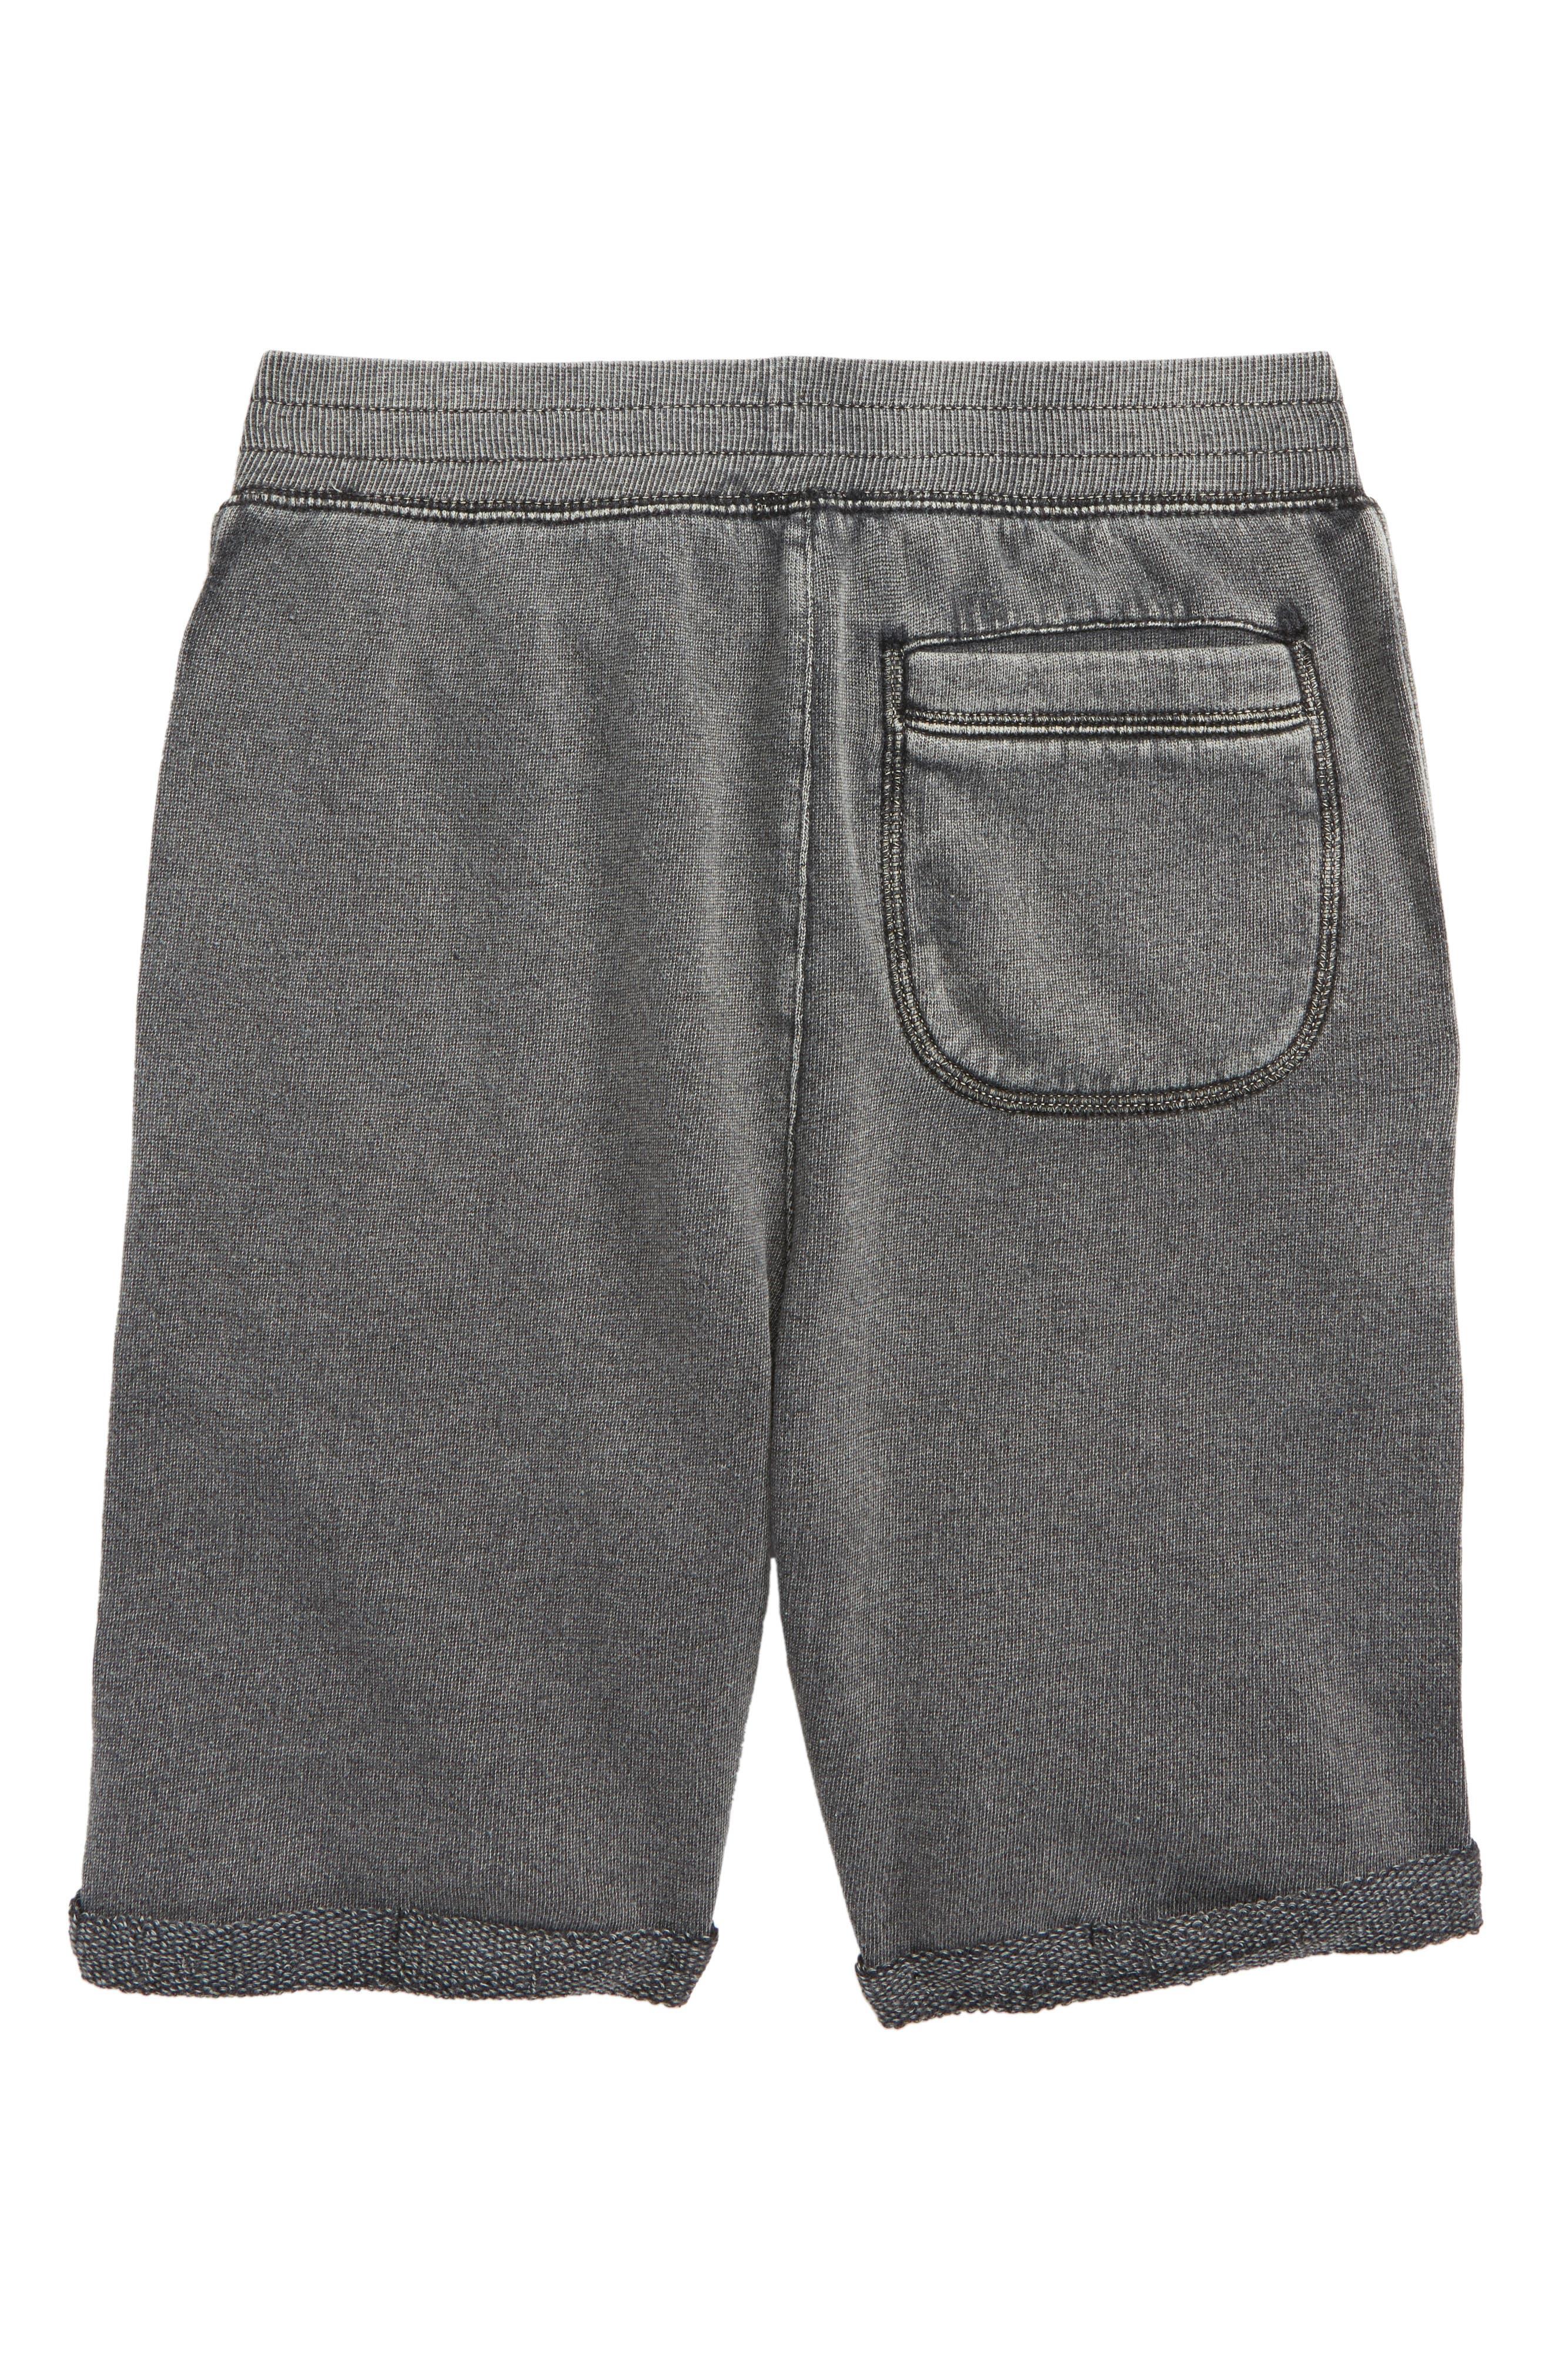 TUCKER + TATE,                             Fleece Shorts,                             Alternate thumbnail 2, color,                             001